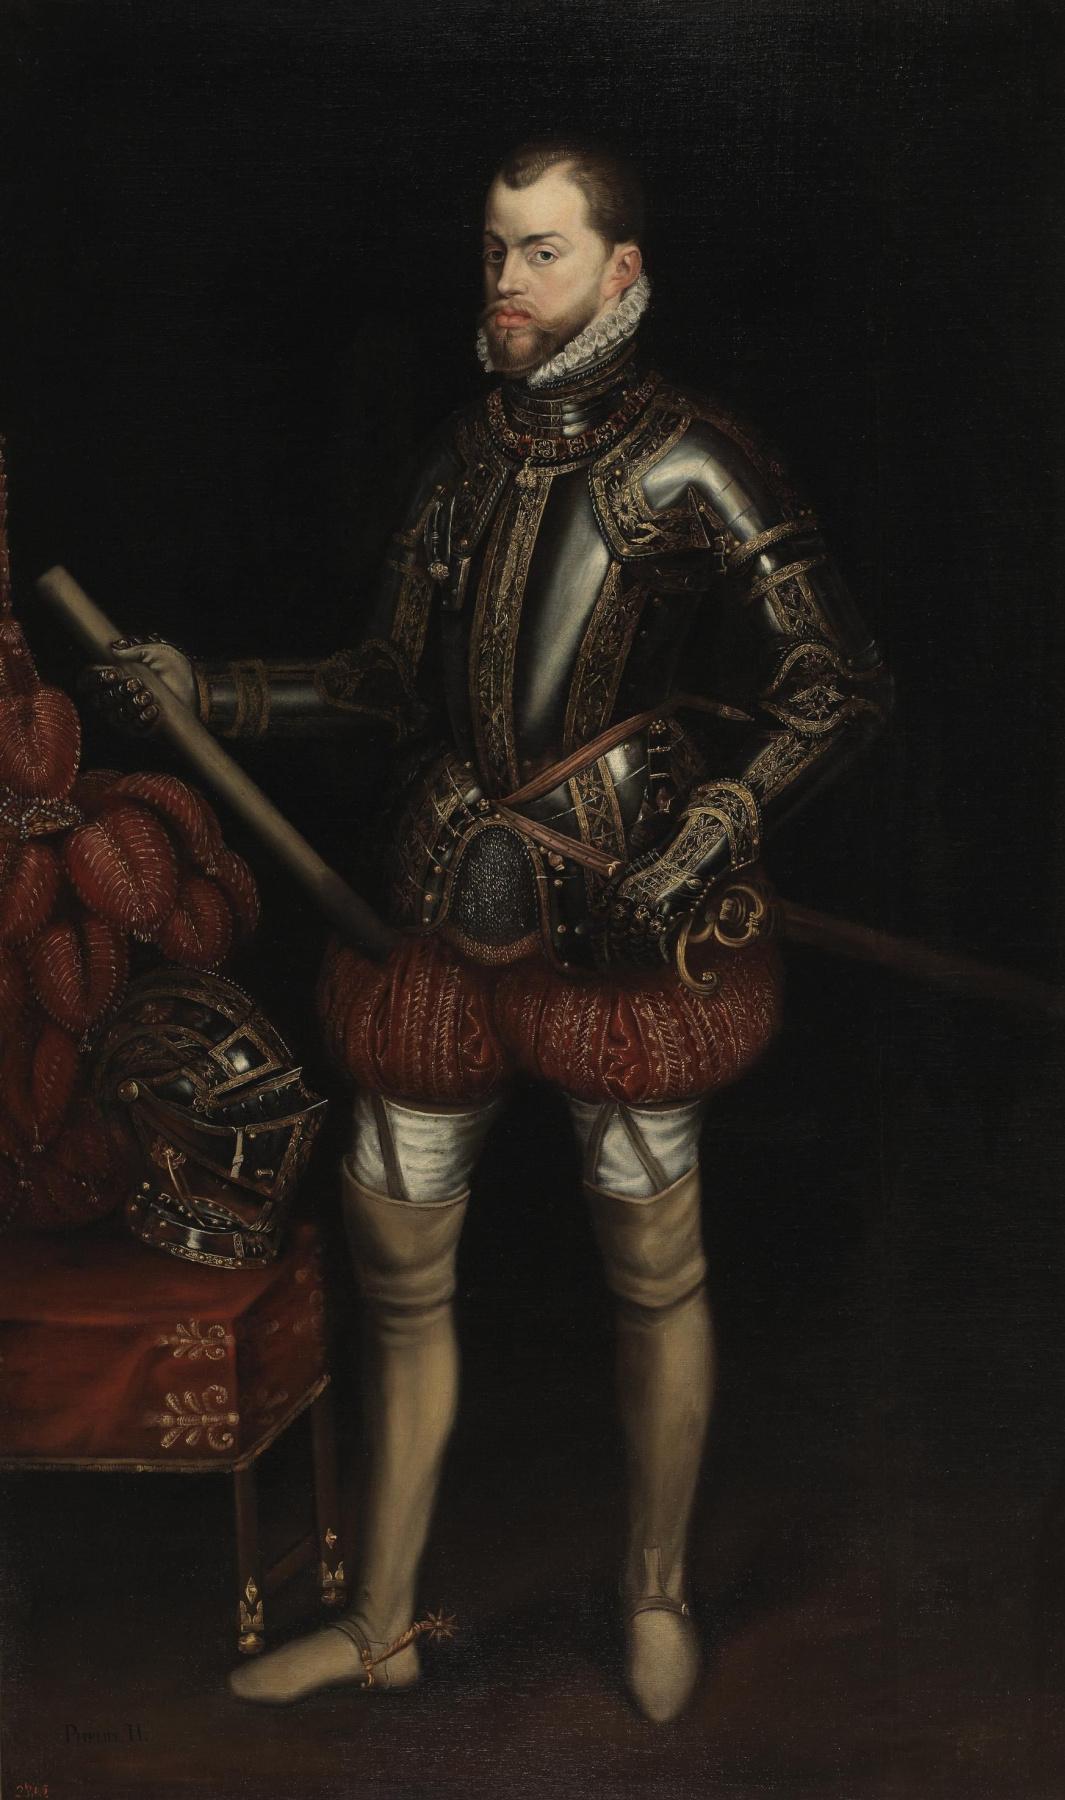 Unknown artist. Portrait of Philip II of Spain in armor